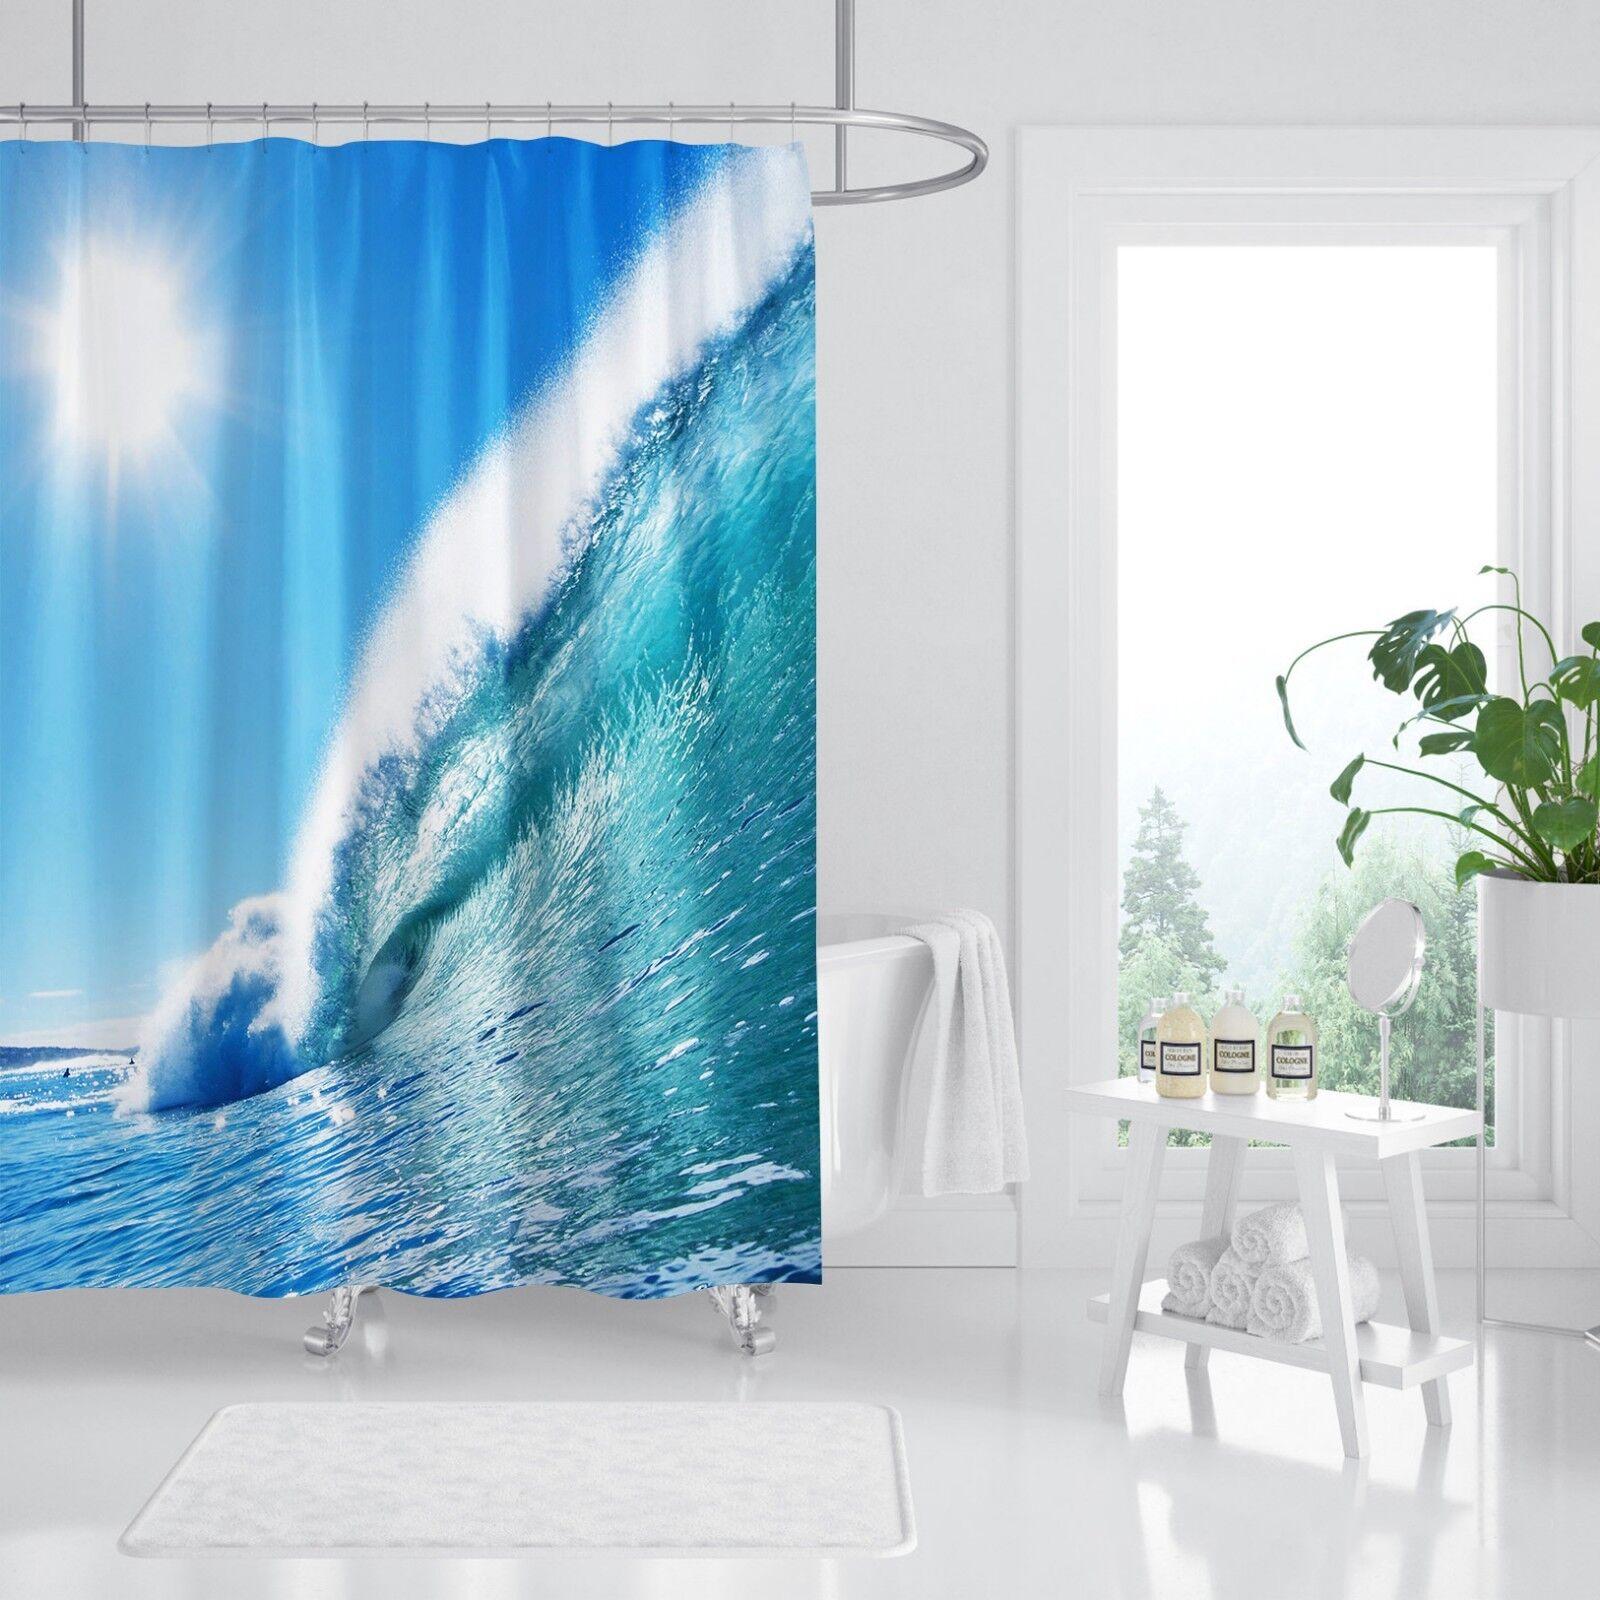 3D Sonne Ozean 8 Duschvorhang Wasserdicht Faser Bad Daheim Windows Toilette DE